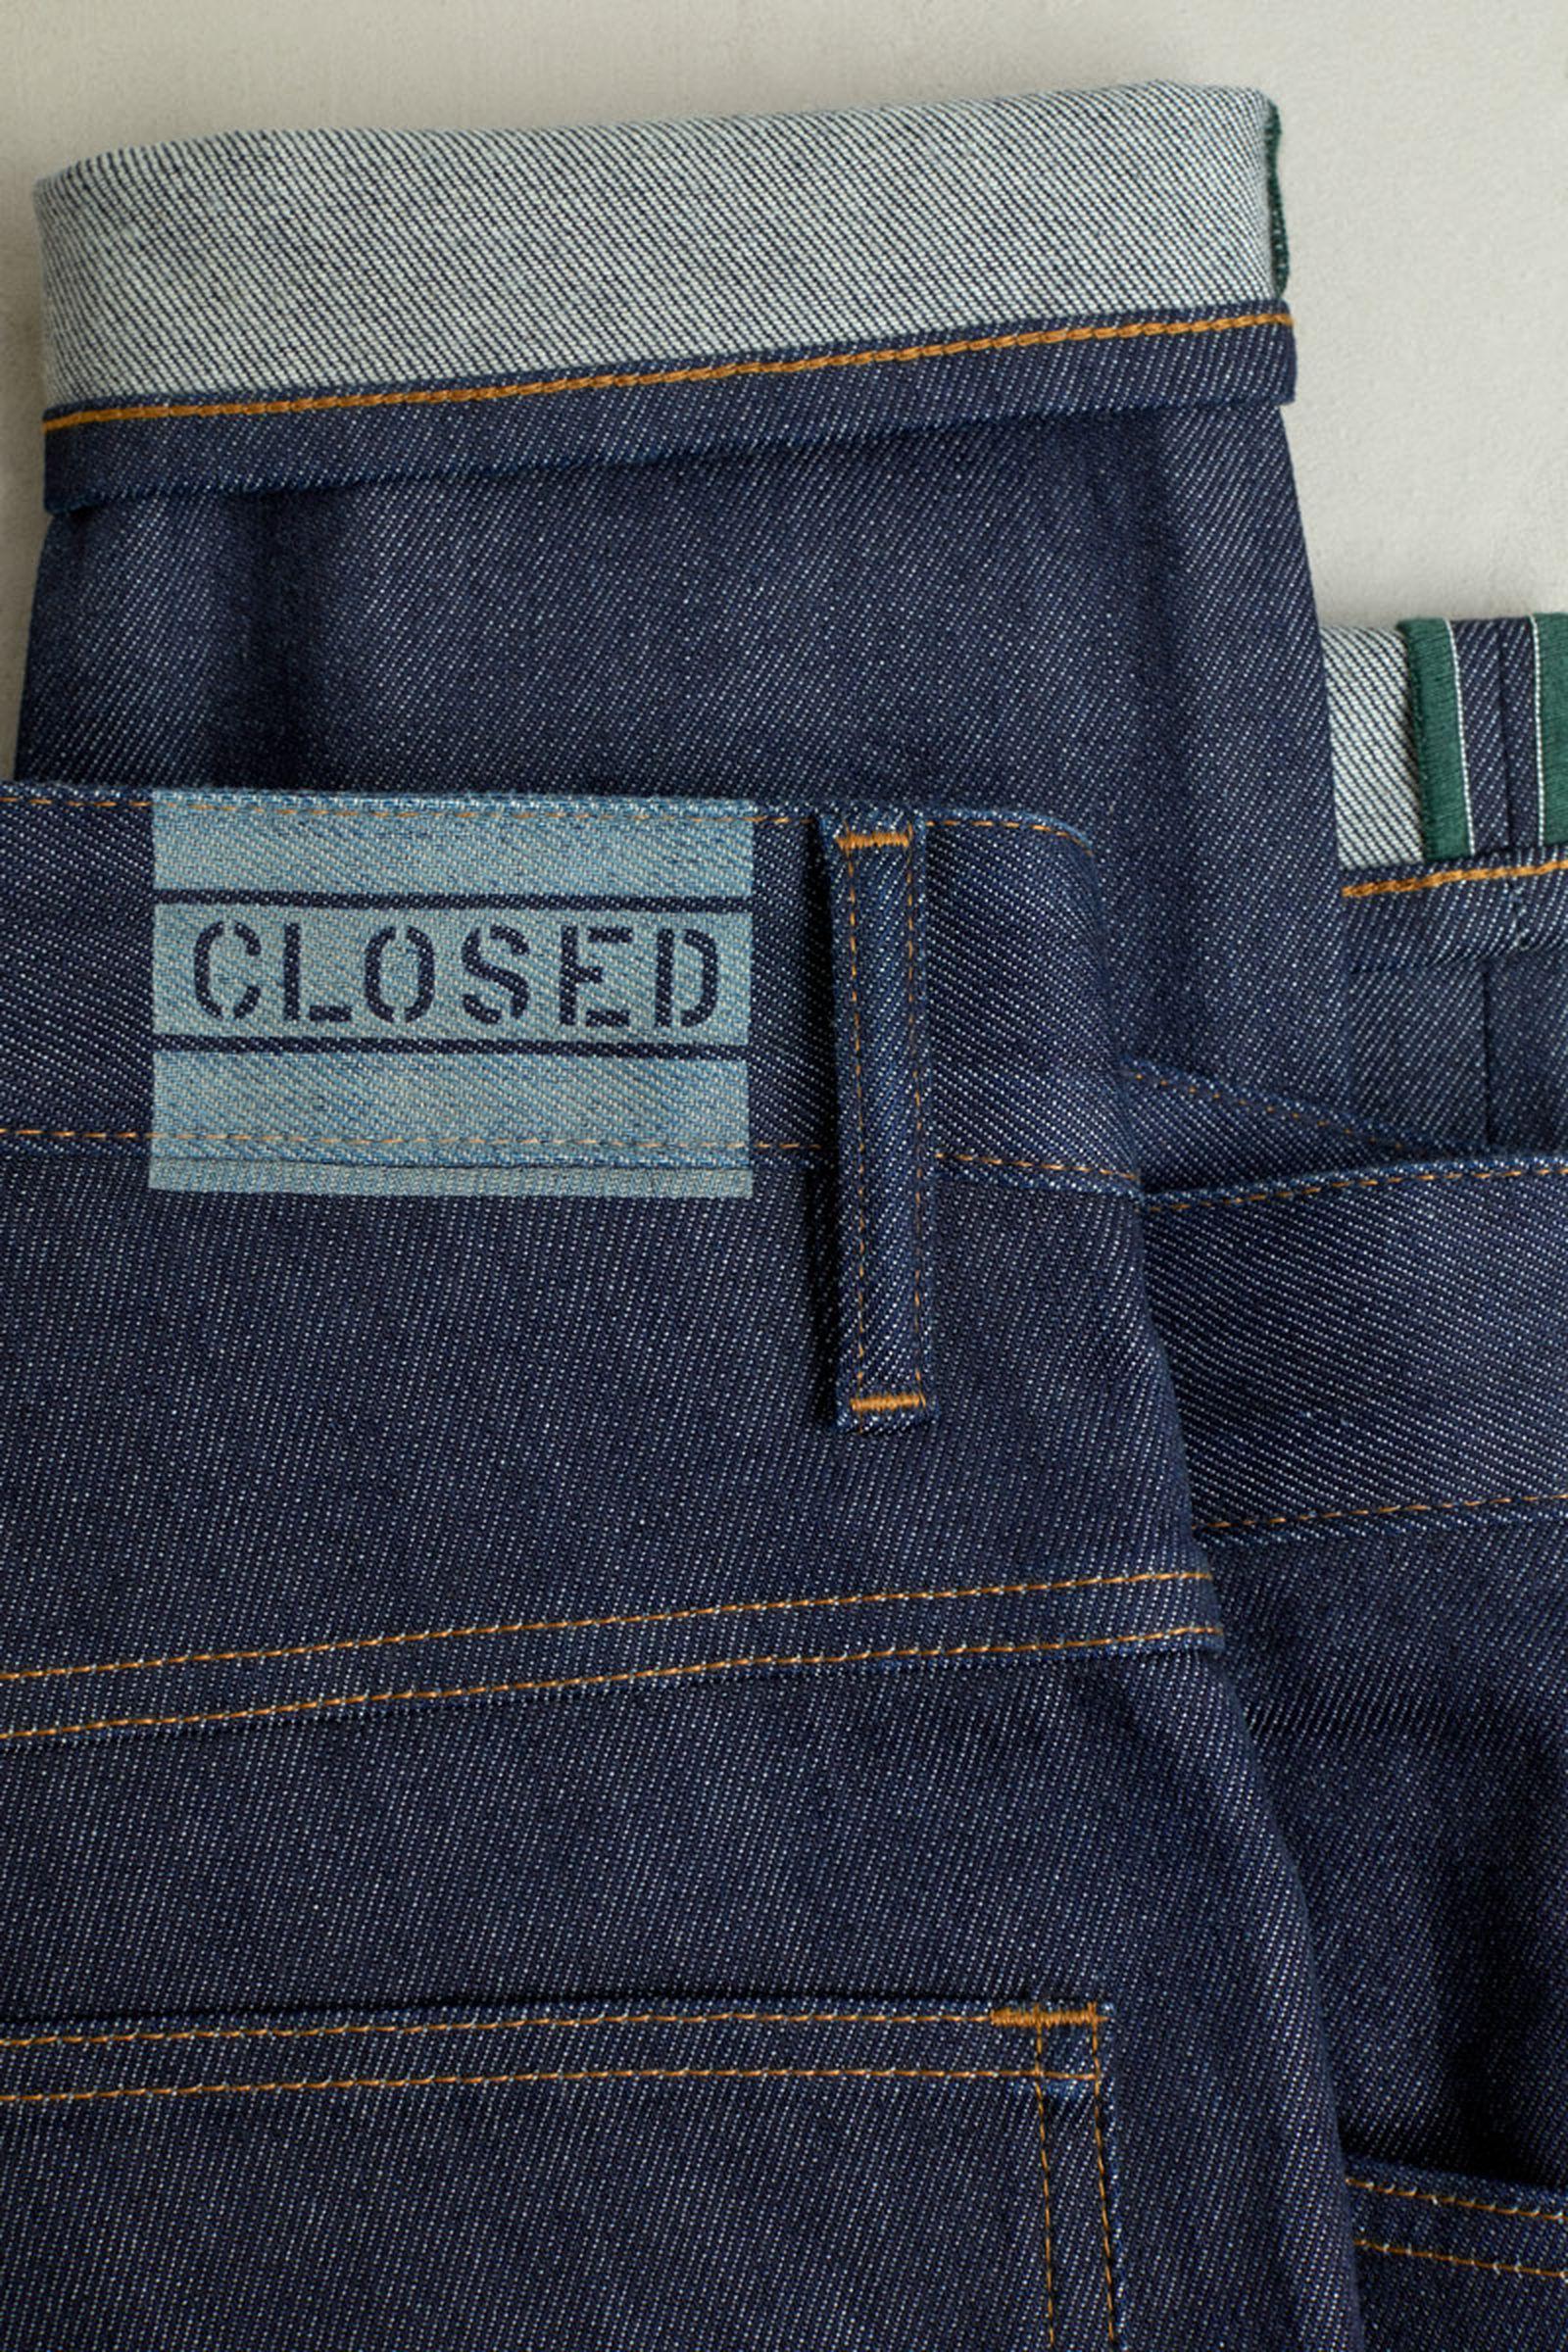 closed-degrable-denim-07